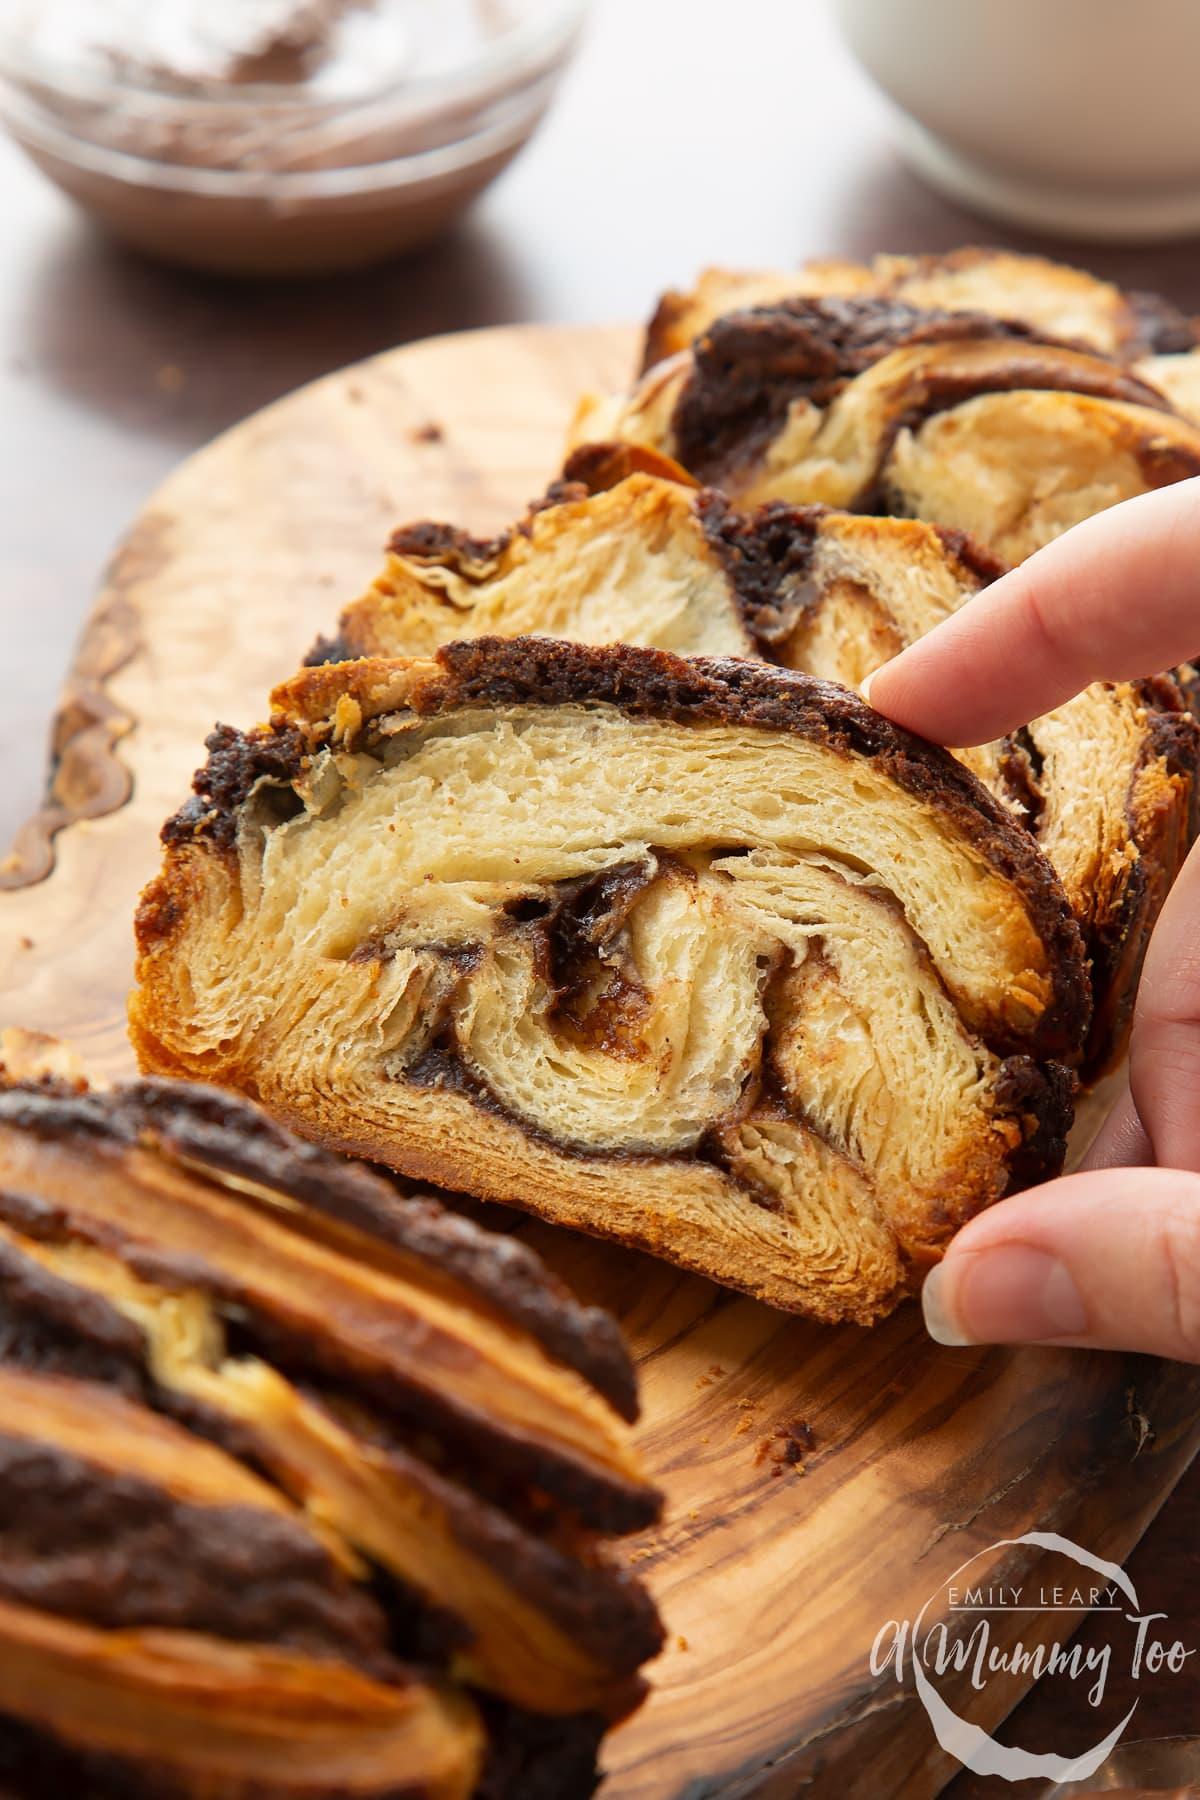 Hand reaching for a slice of cinnamon swirl babka on a wooden board.